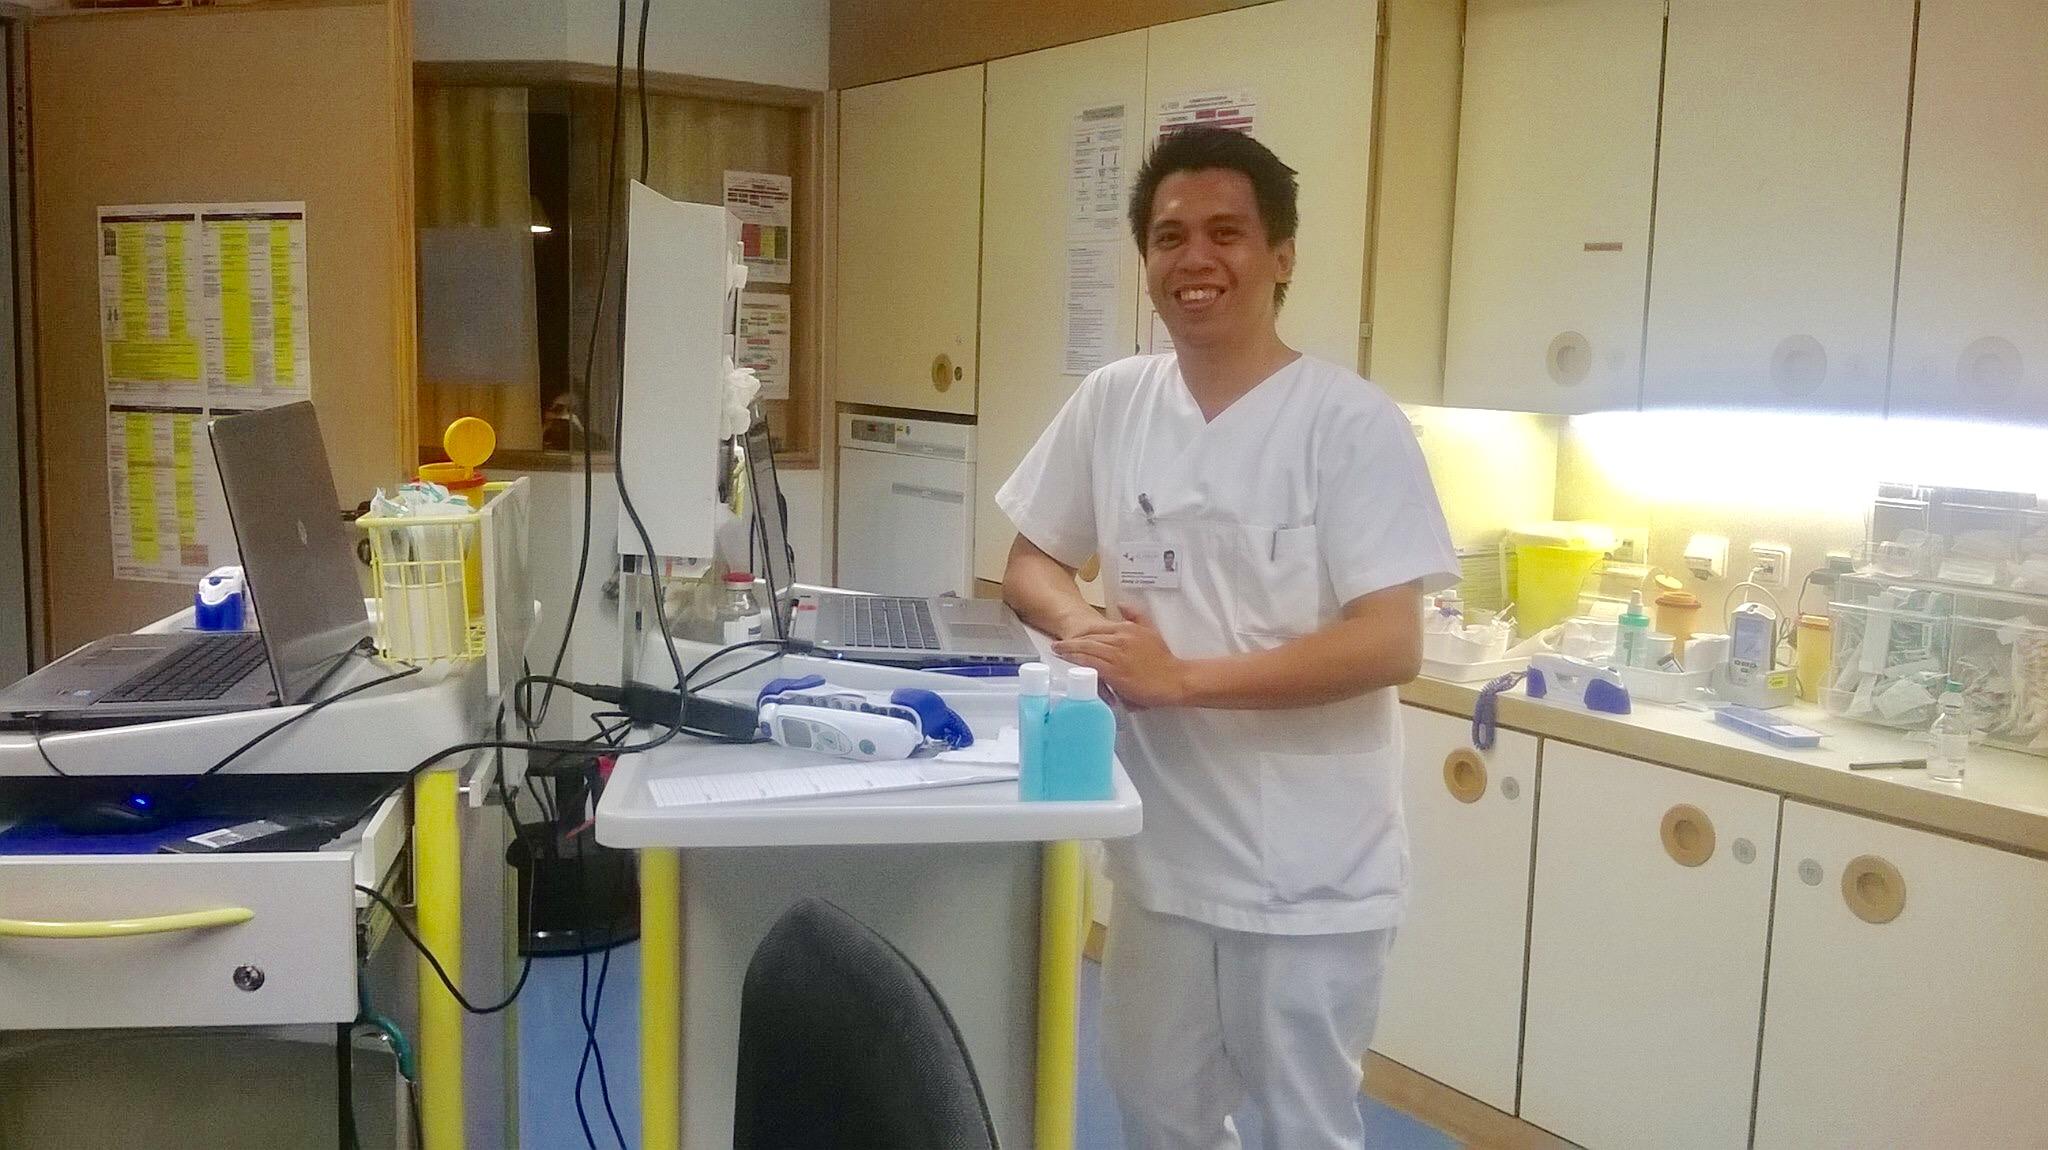 FILIPINO NURSE. Jimmy Carpon has finally become a full-fledged nurse at the University Hospital Tubingen in Germany.